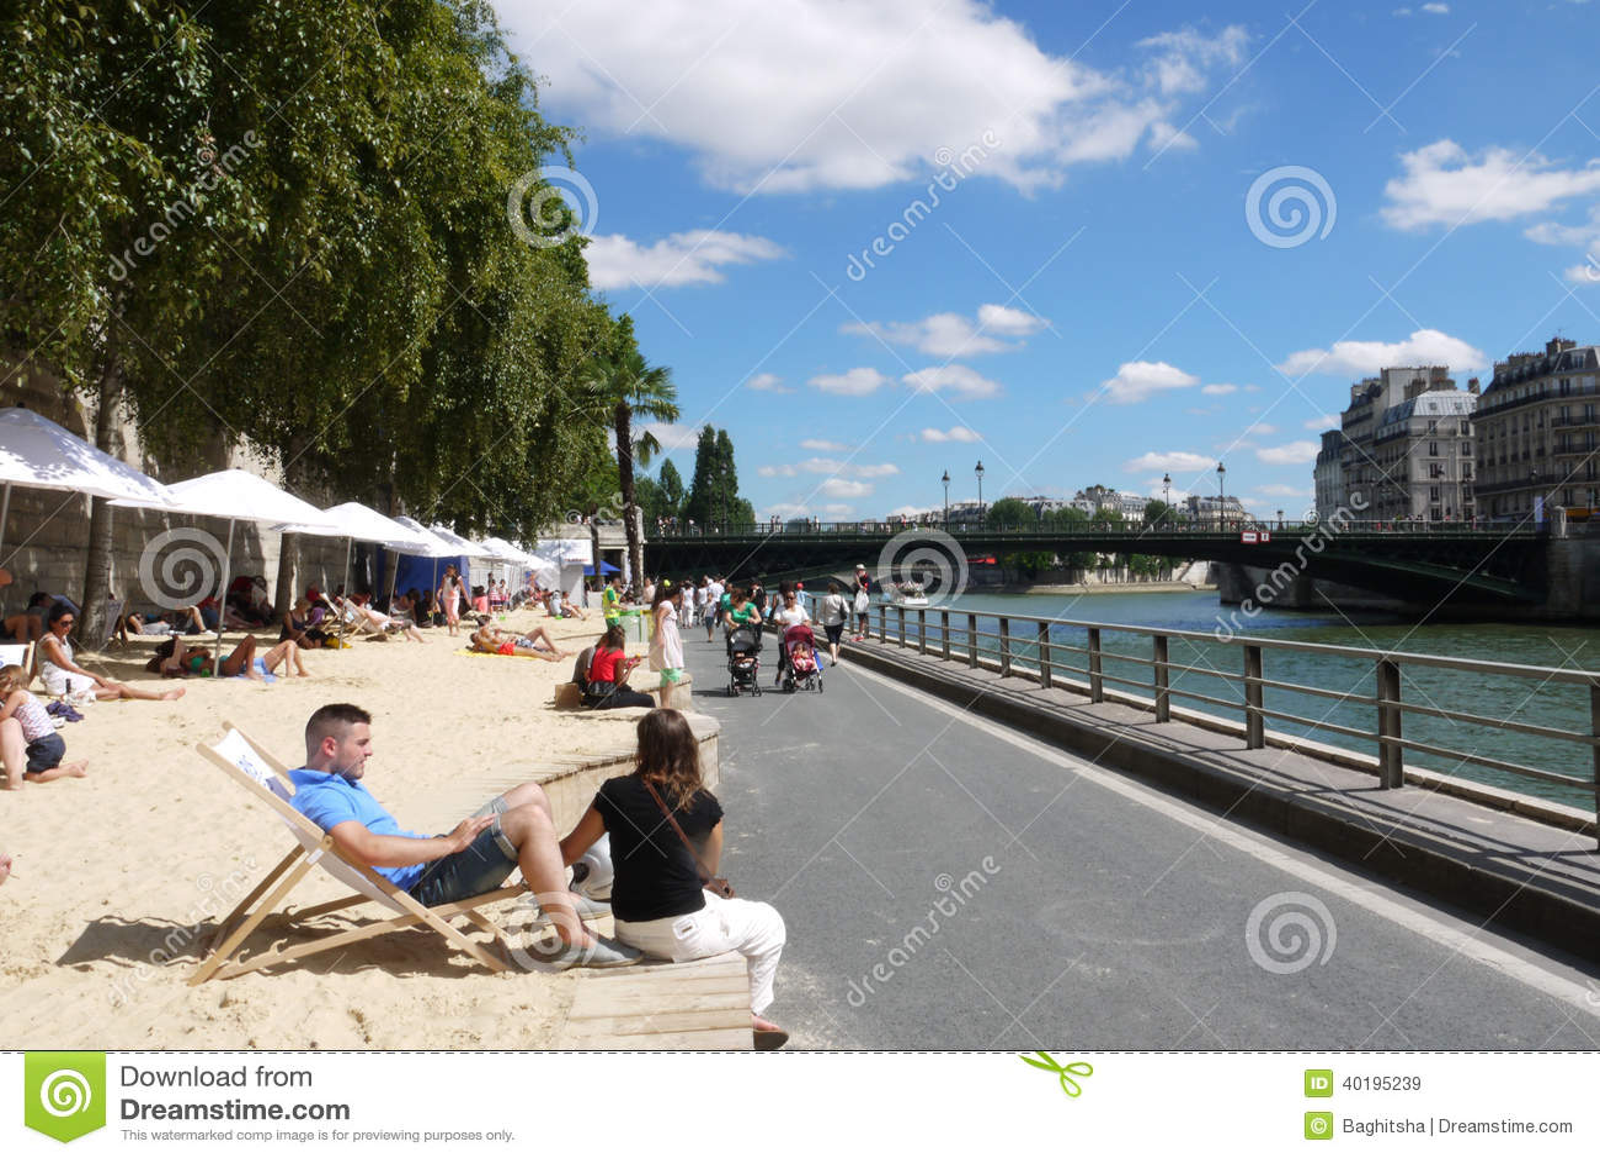 Paris Plages Beaches